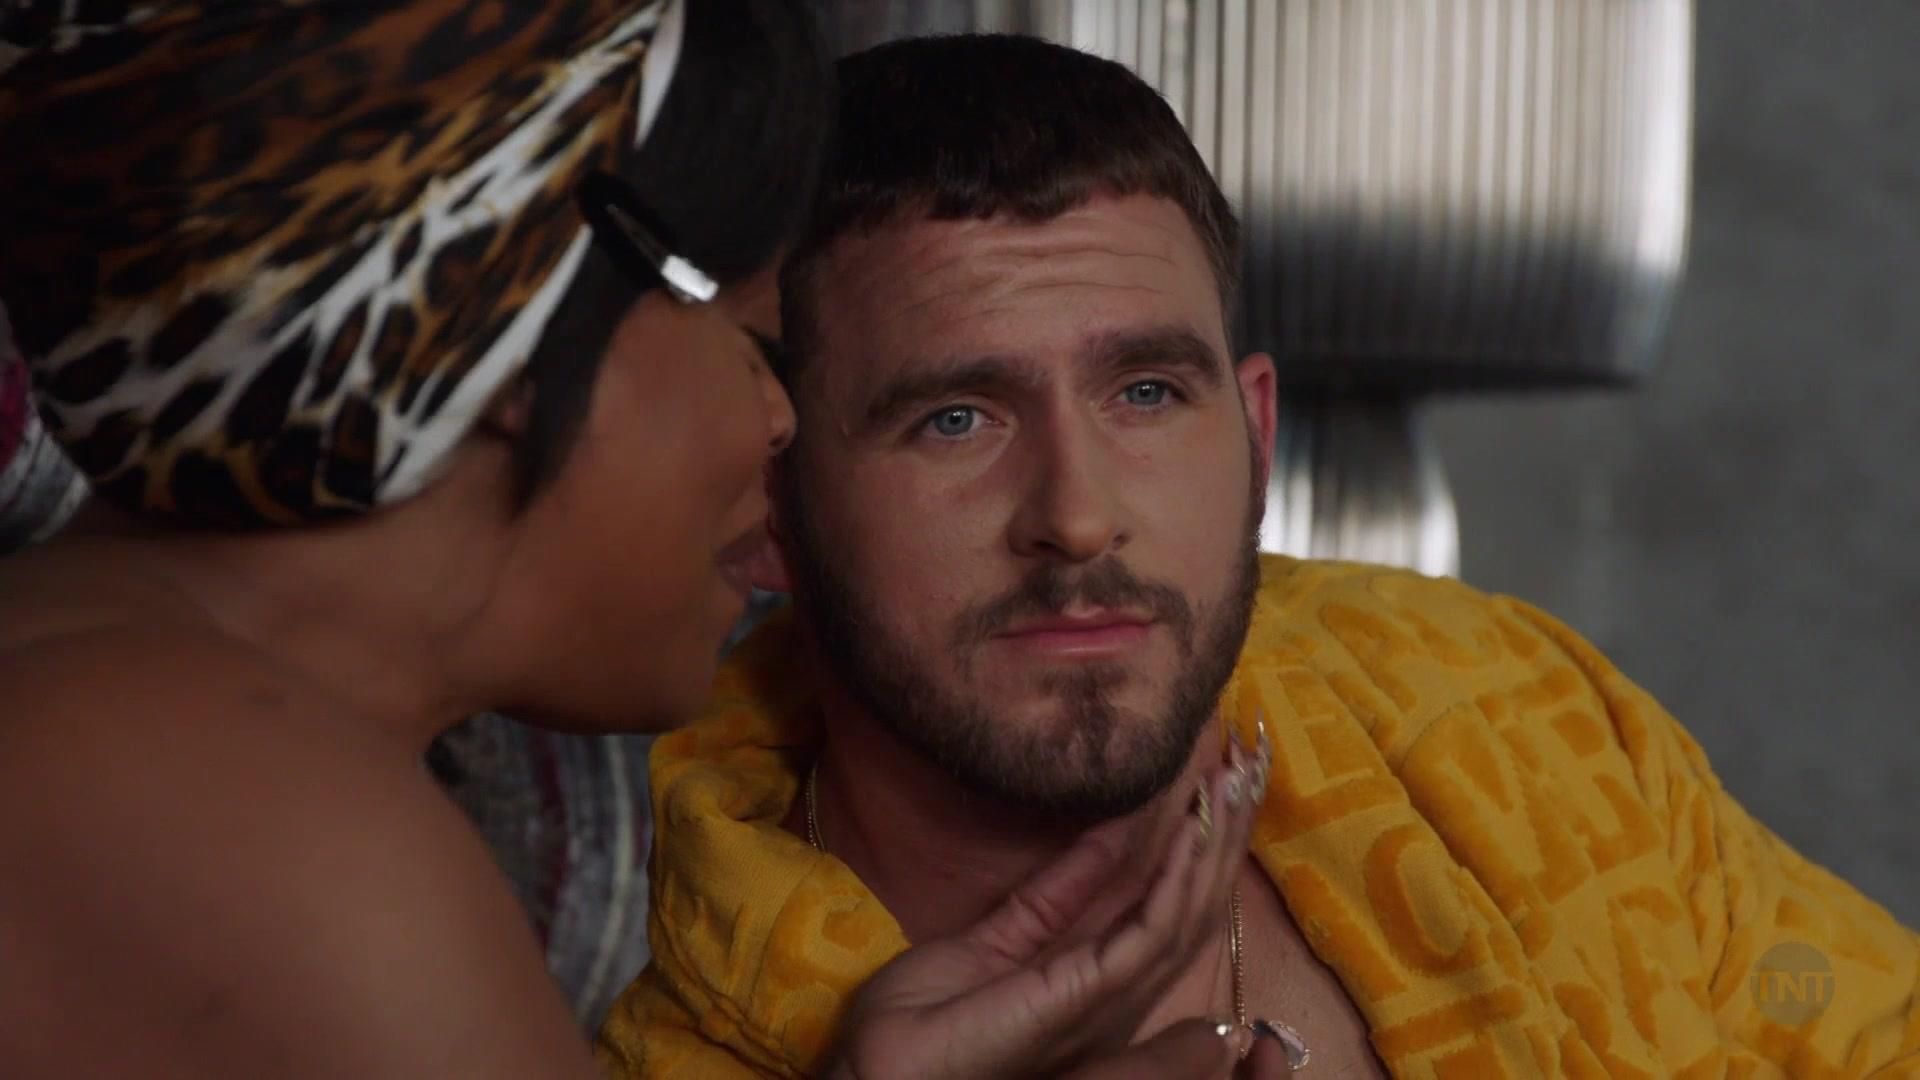 Versace Yellow Bathrobe Worn By Jack Kesy As Roller Husser In Claws - Season 3. Episode 10. Finna (2019)